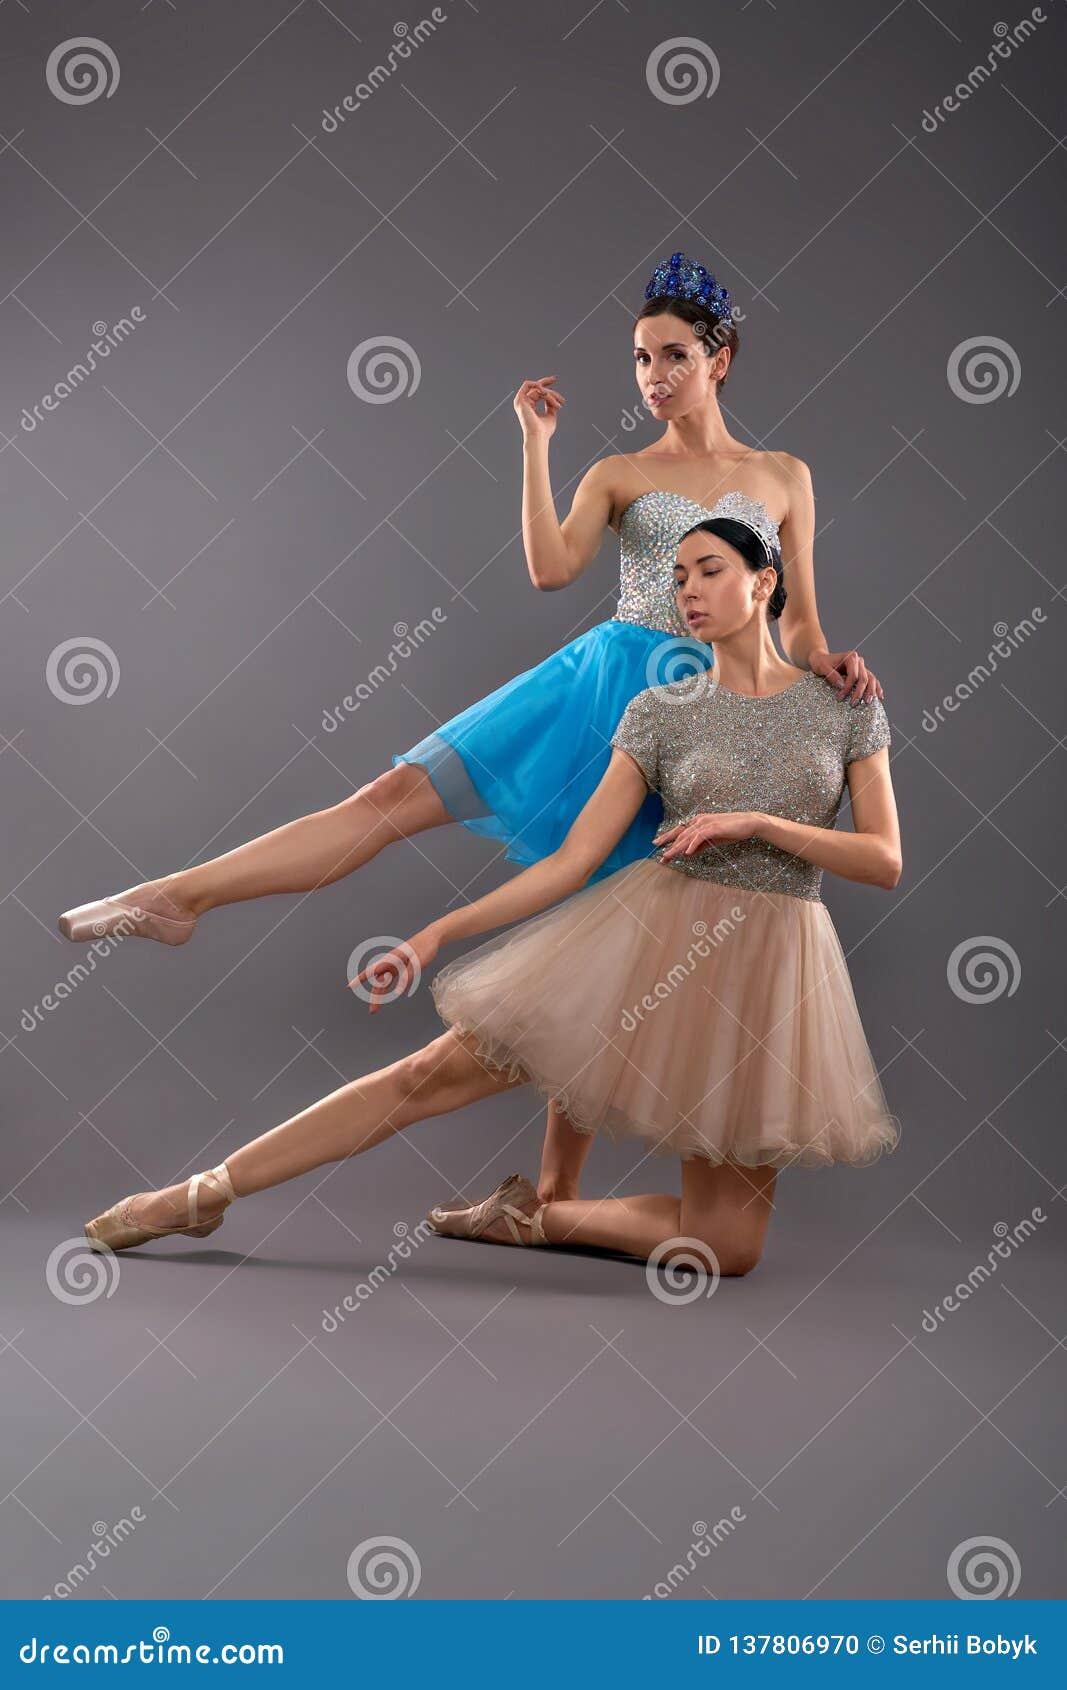 Främre sikt av unga kvinnliga dansare som poserar i studio